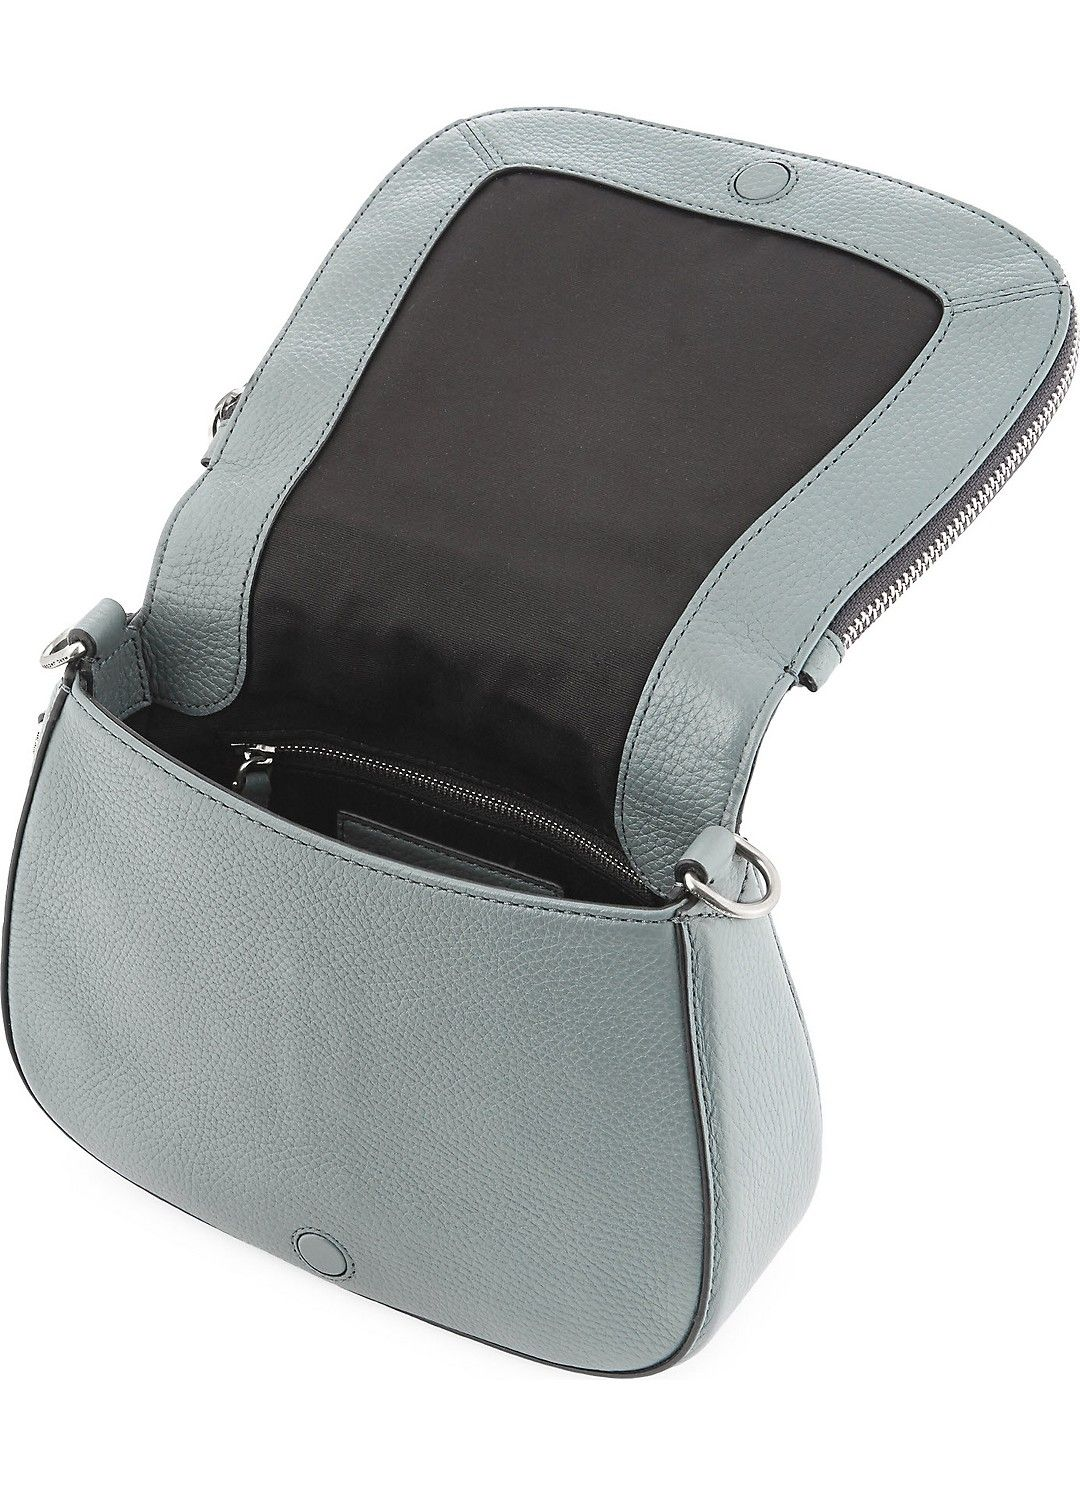 ec5c964c4e MARC JACOBS - Recruit leather saddle bag